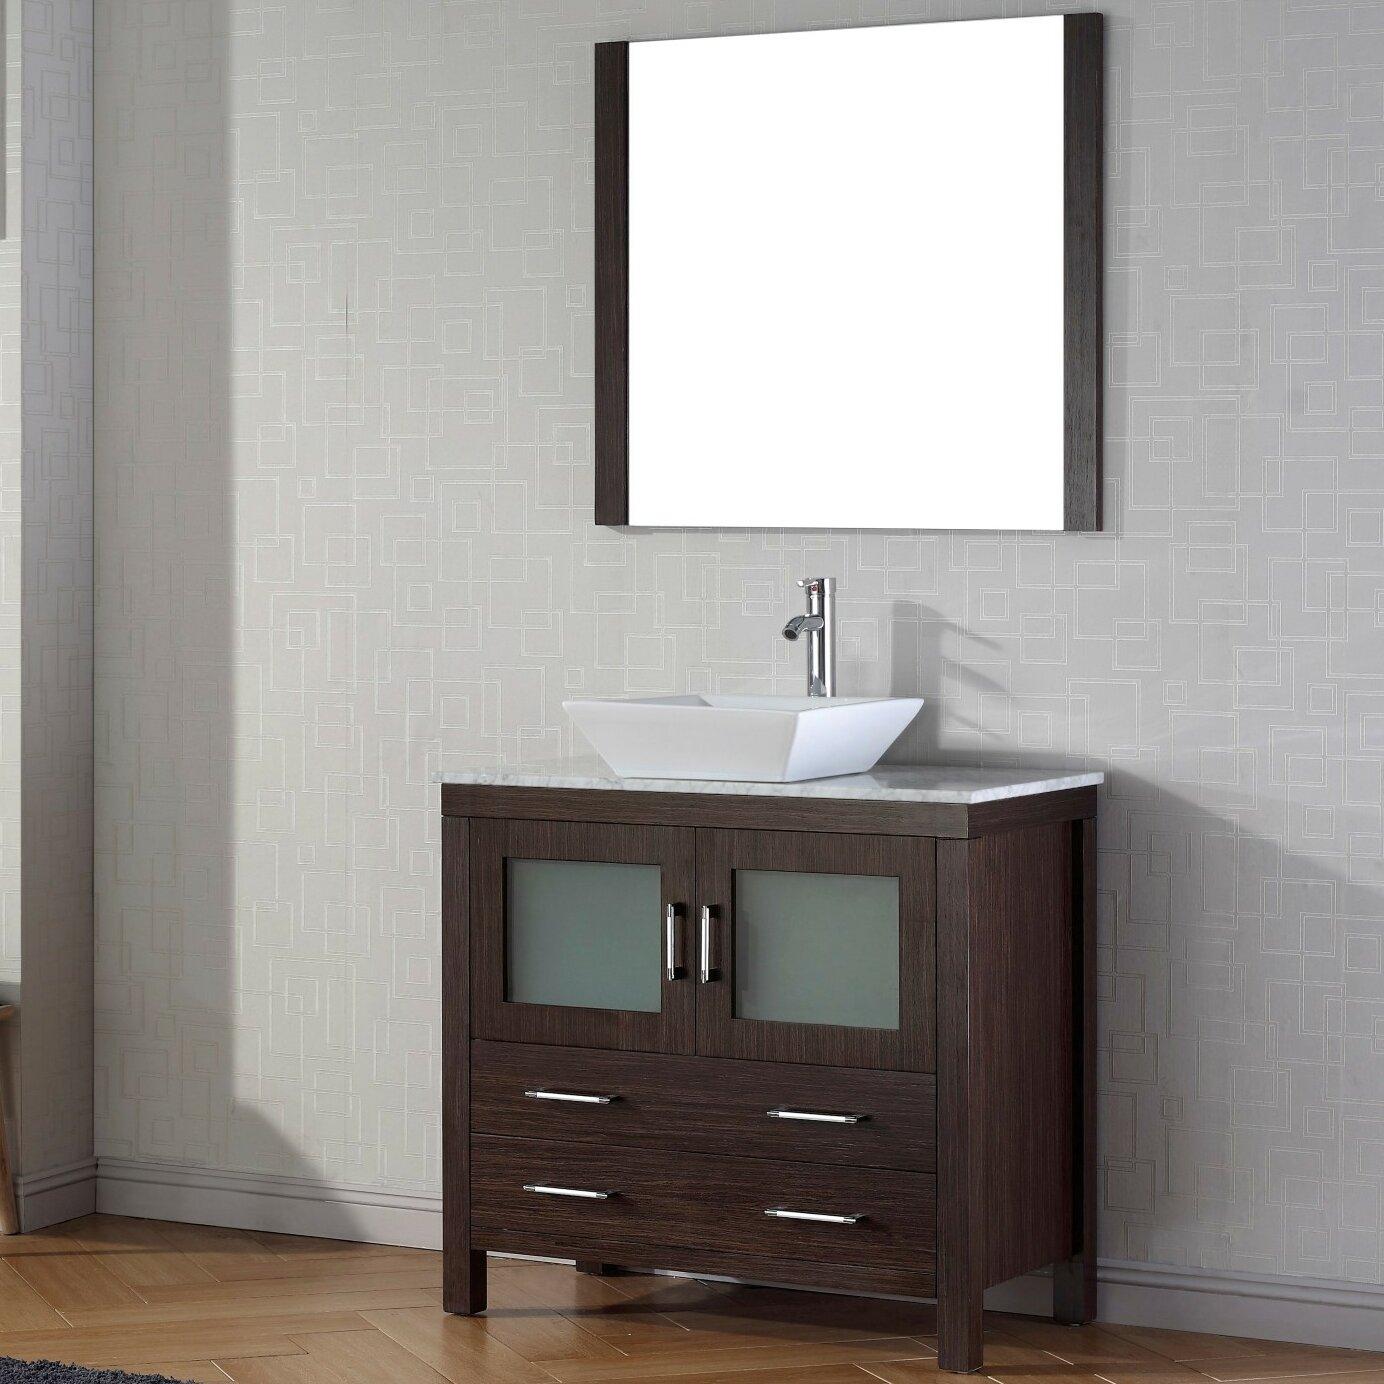 "Dior 32"" Single Bathroom Vanity Set with Mirror and Marble Top"